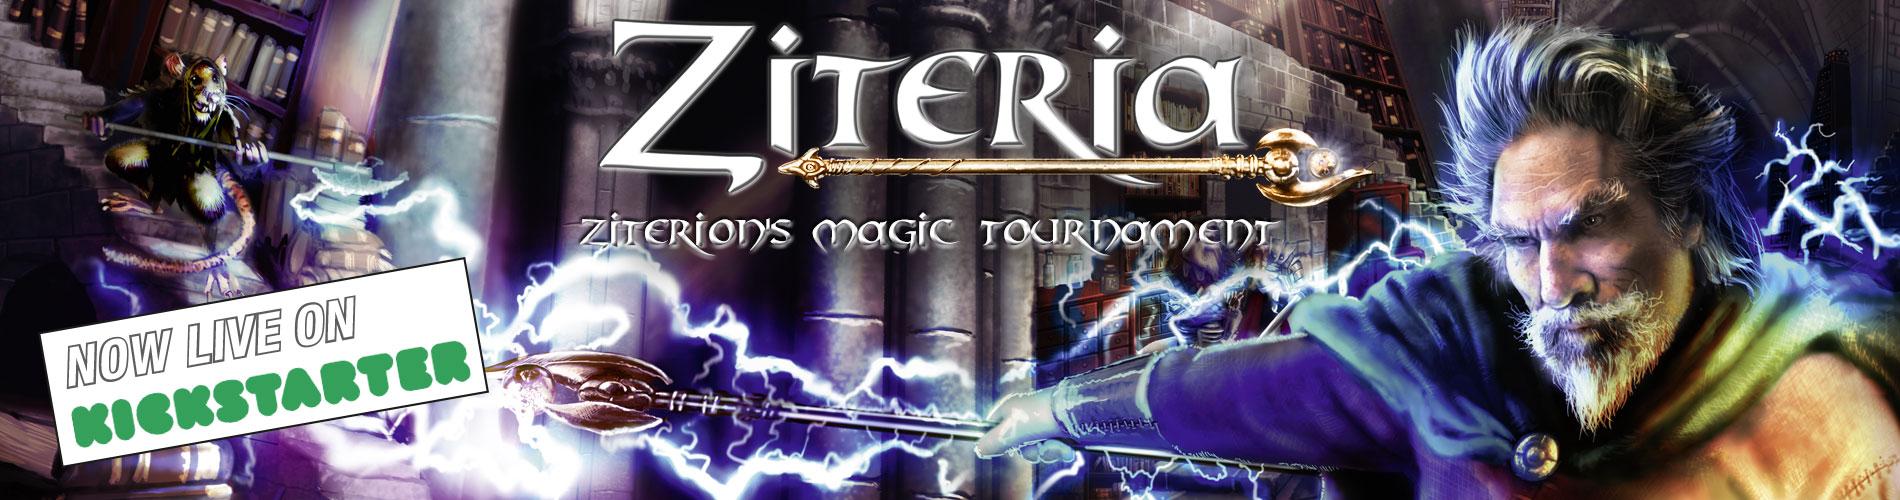 ZITERAI - Ziterion's Magic Tournament Dungeon Crawler live on Kickstarter